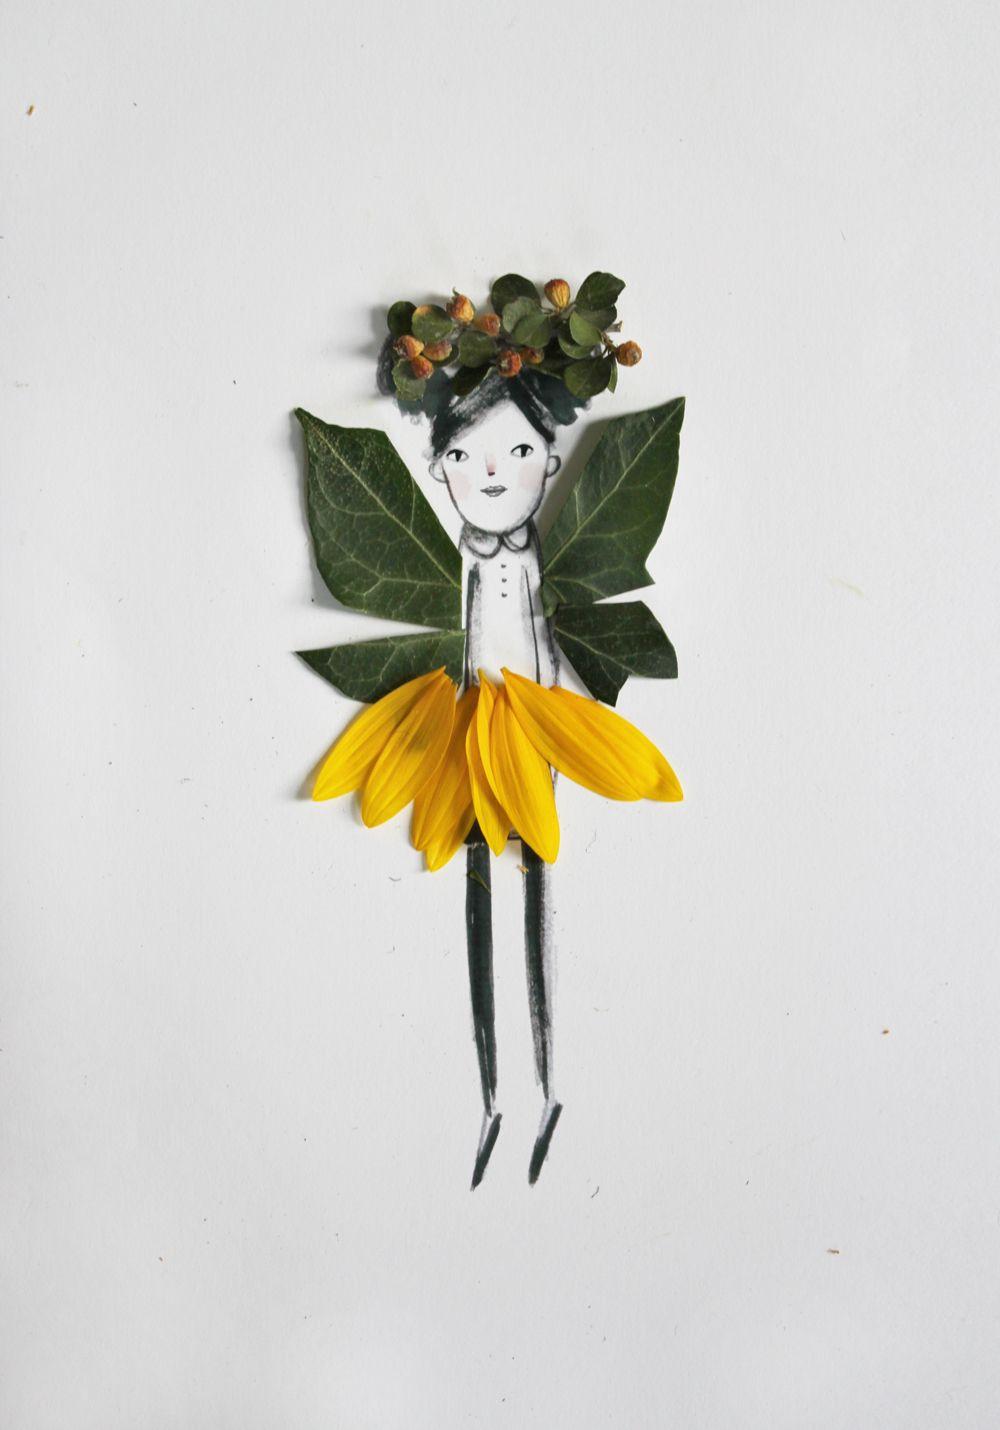 Decorar dibujos con naturaleza  Kireei cosas bellas  Ideas